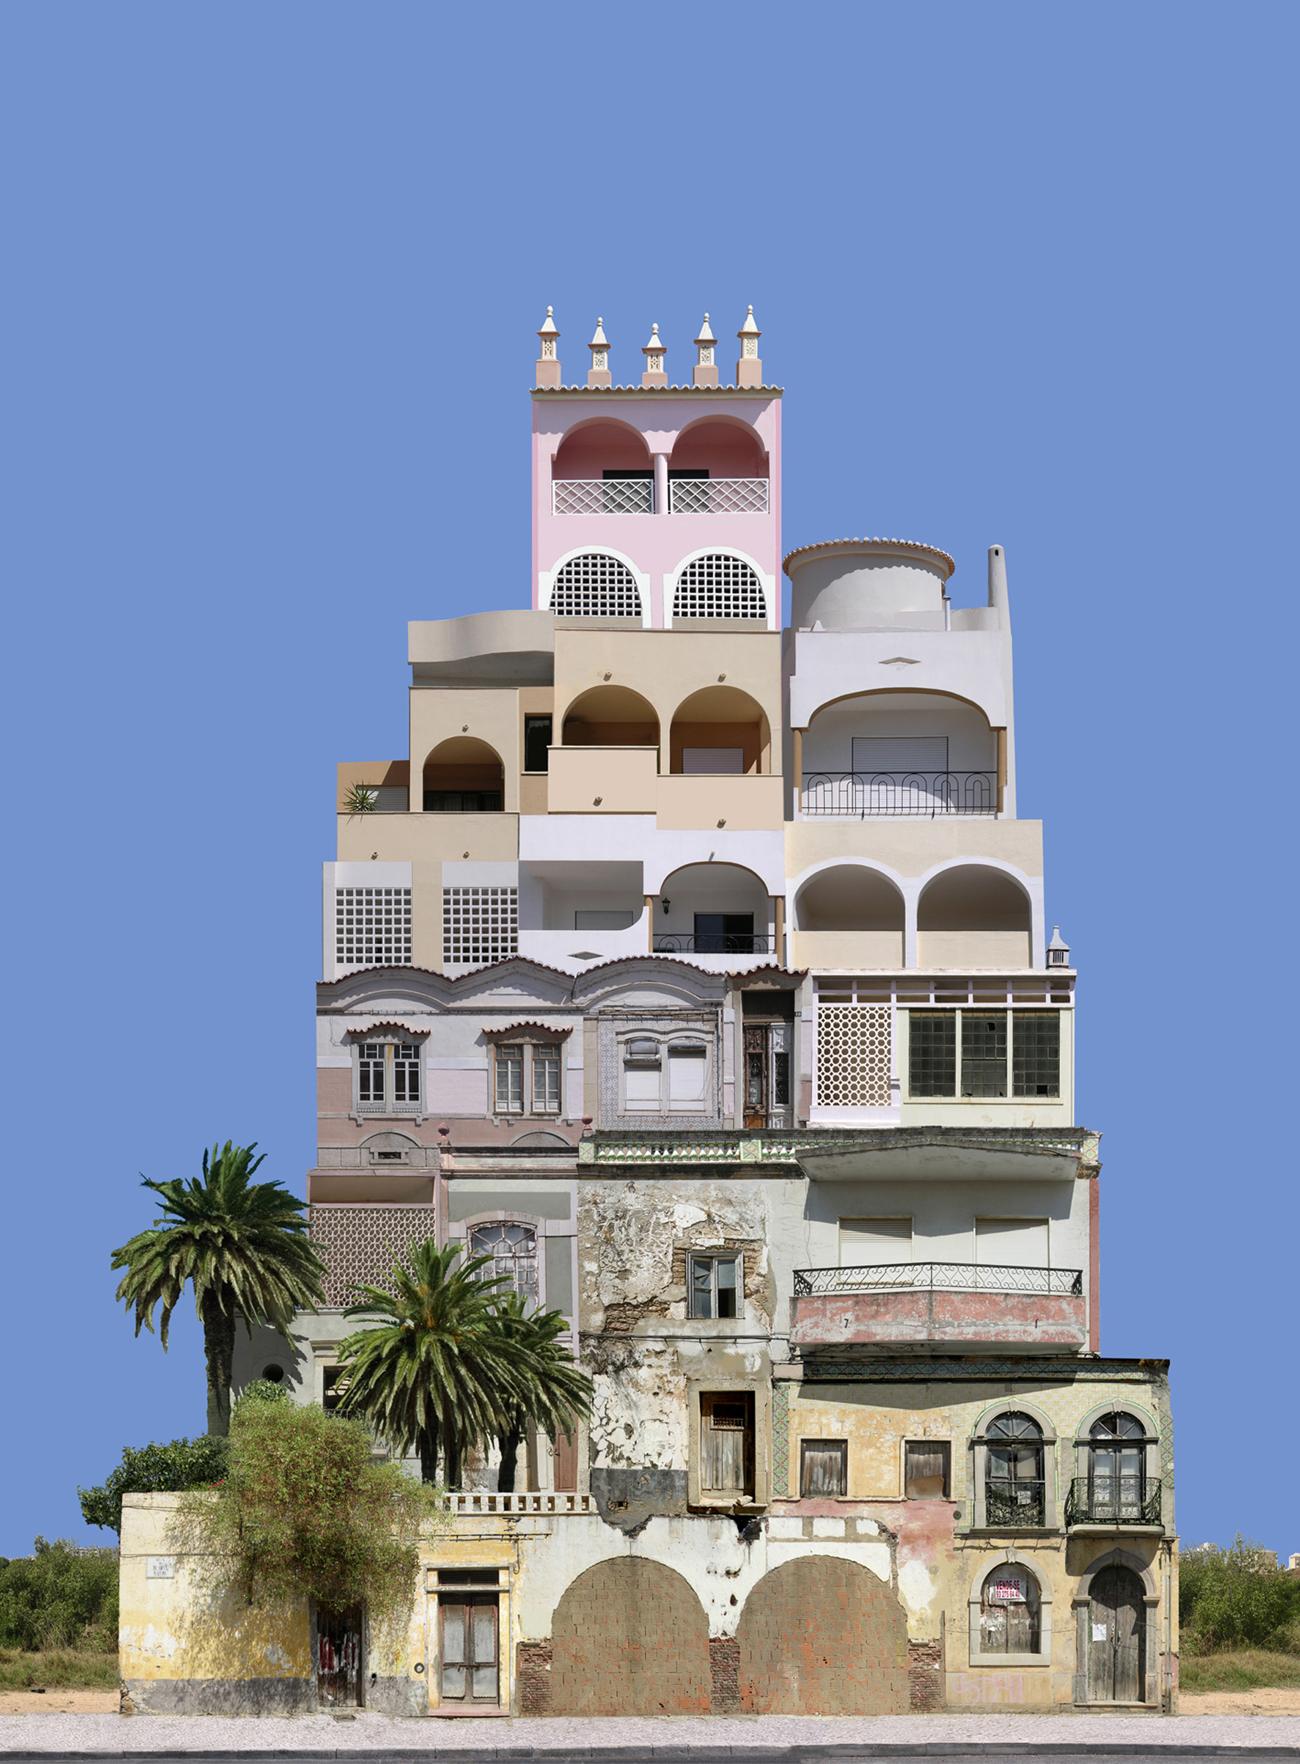 photomontage: aggregate building